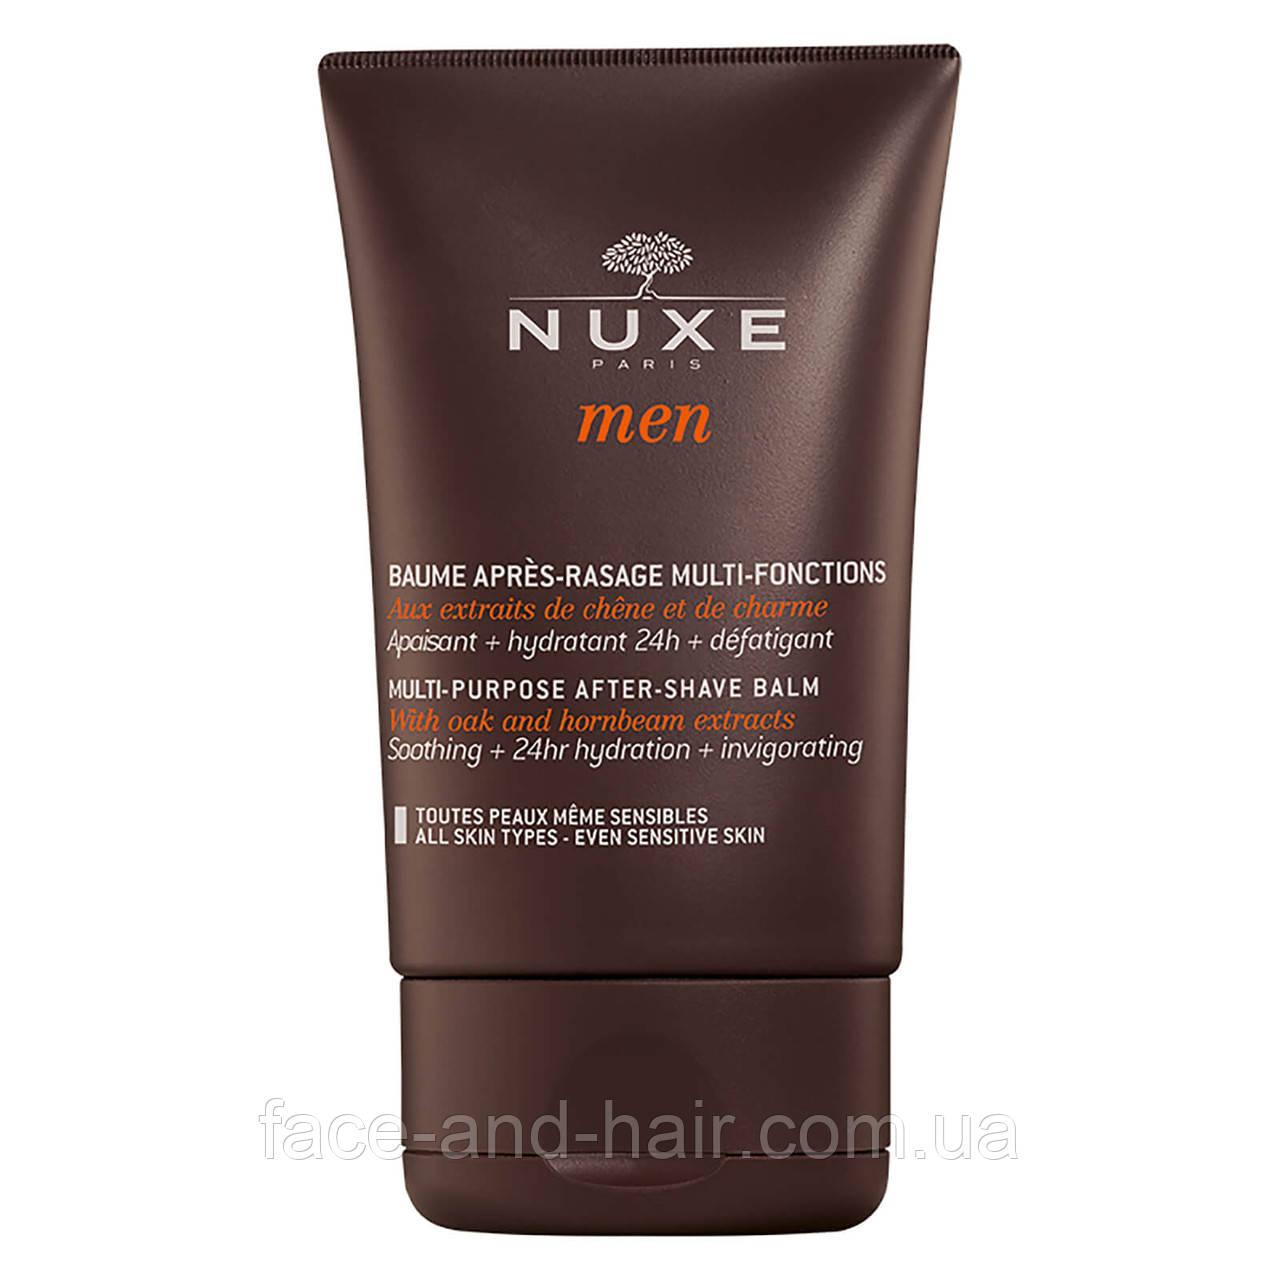 Бальзам после бритья Нюкс Мен Nuxe Men Multi-Purpose After Shave Balmn 50 мл